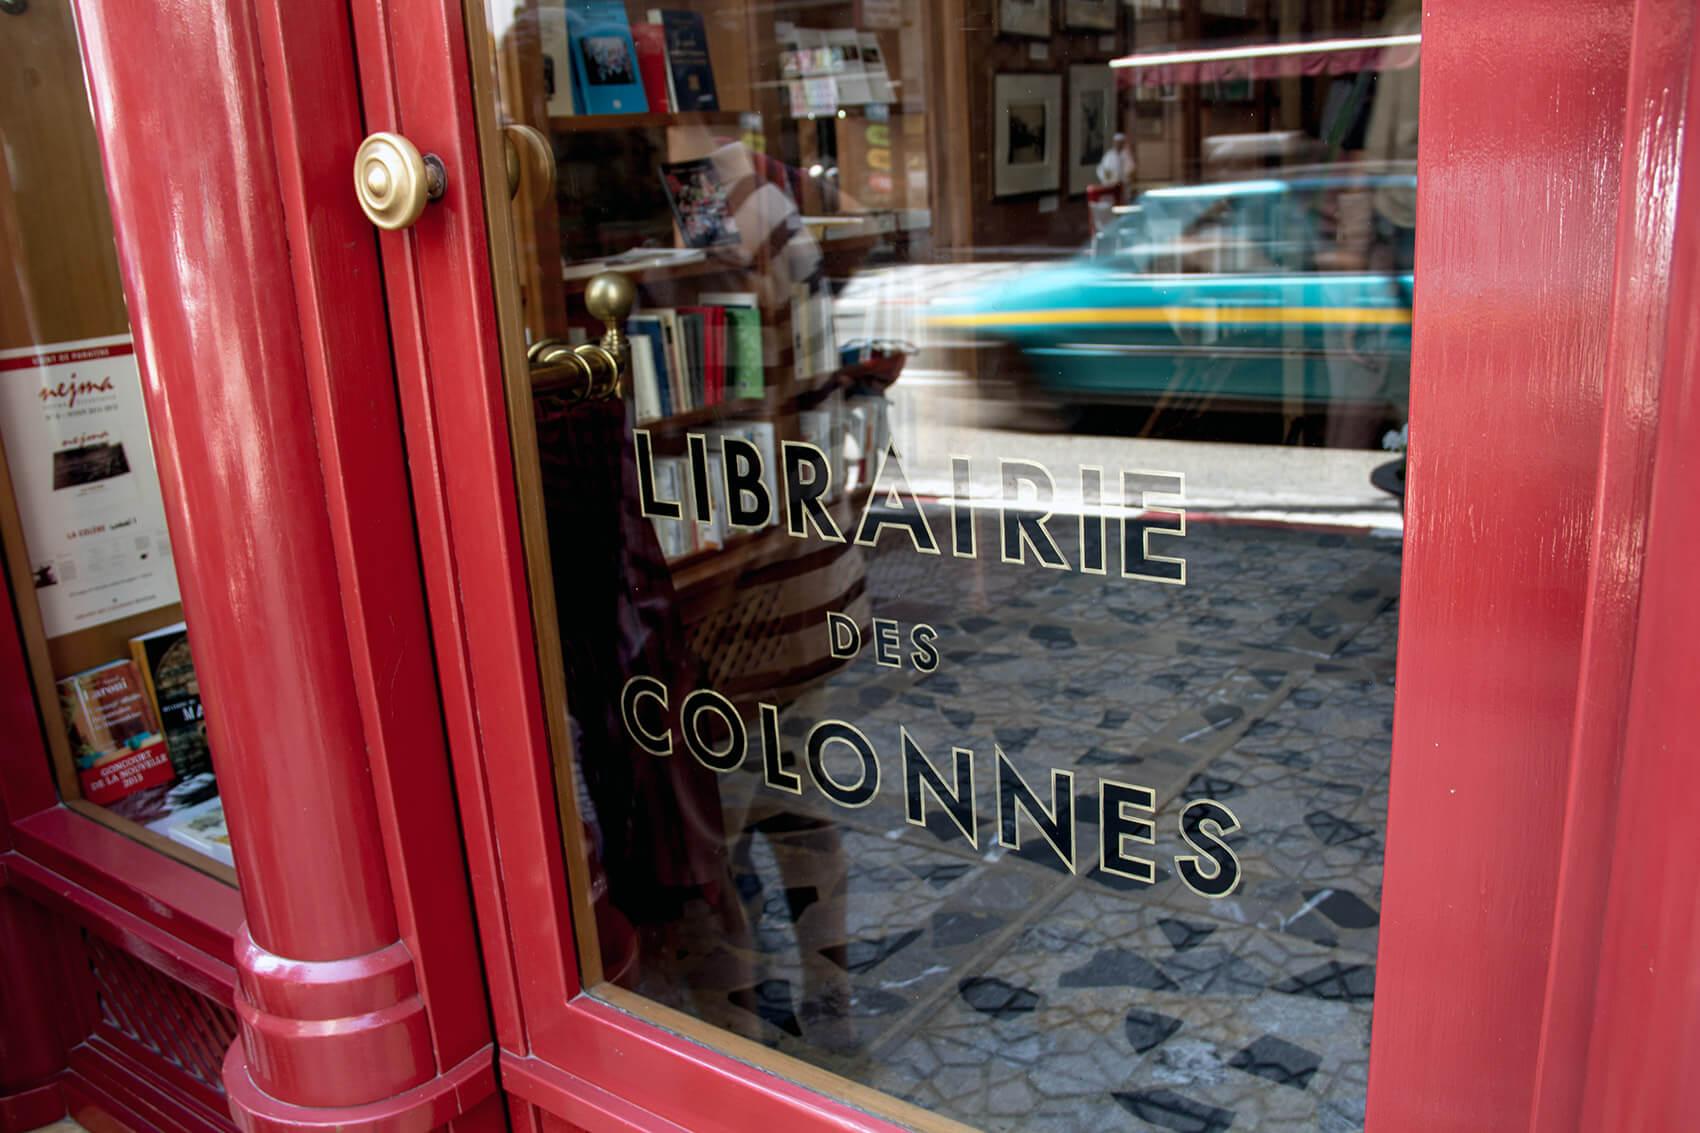 Librairie Des Colonnes in Tangeri